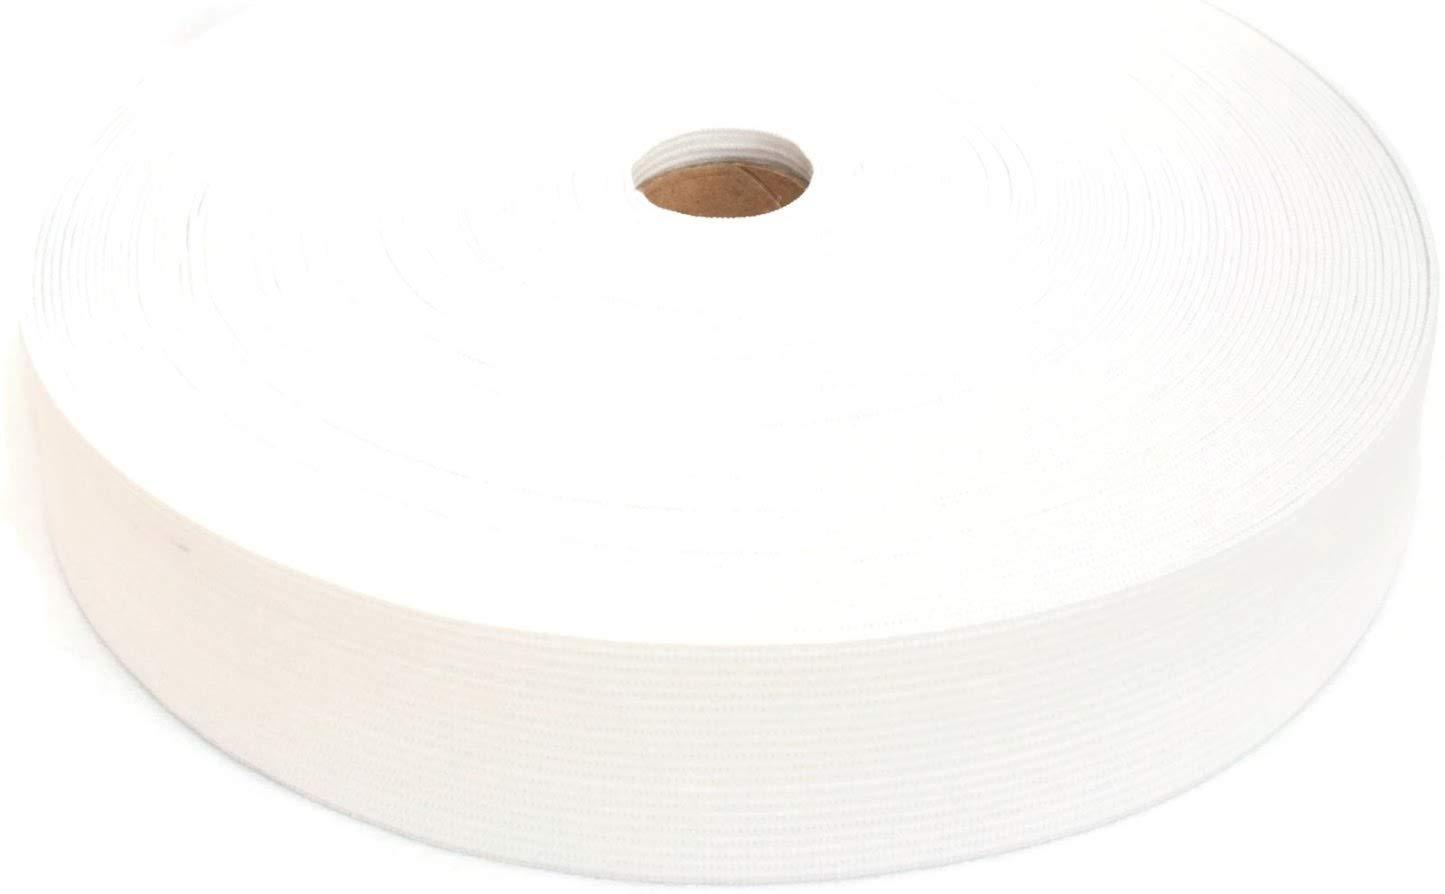 25 Meter Elastic Band 30 mm wide - White JAJASIO